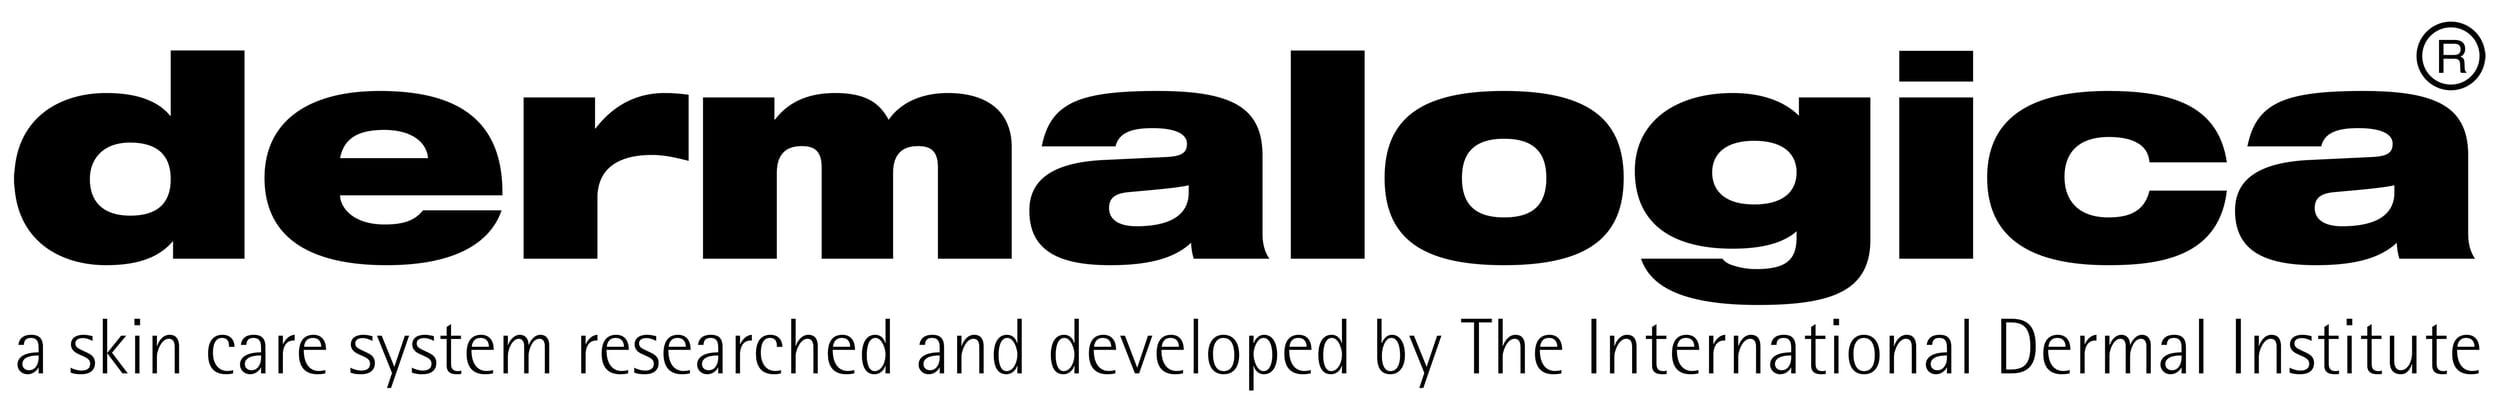 brand_logo.jpg